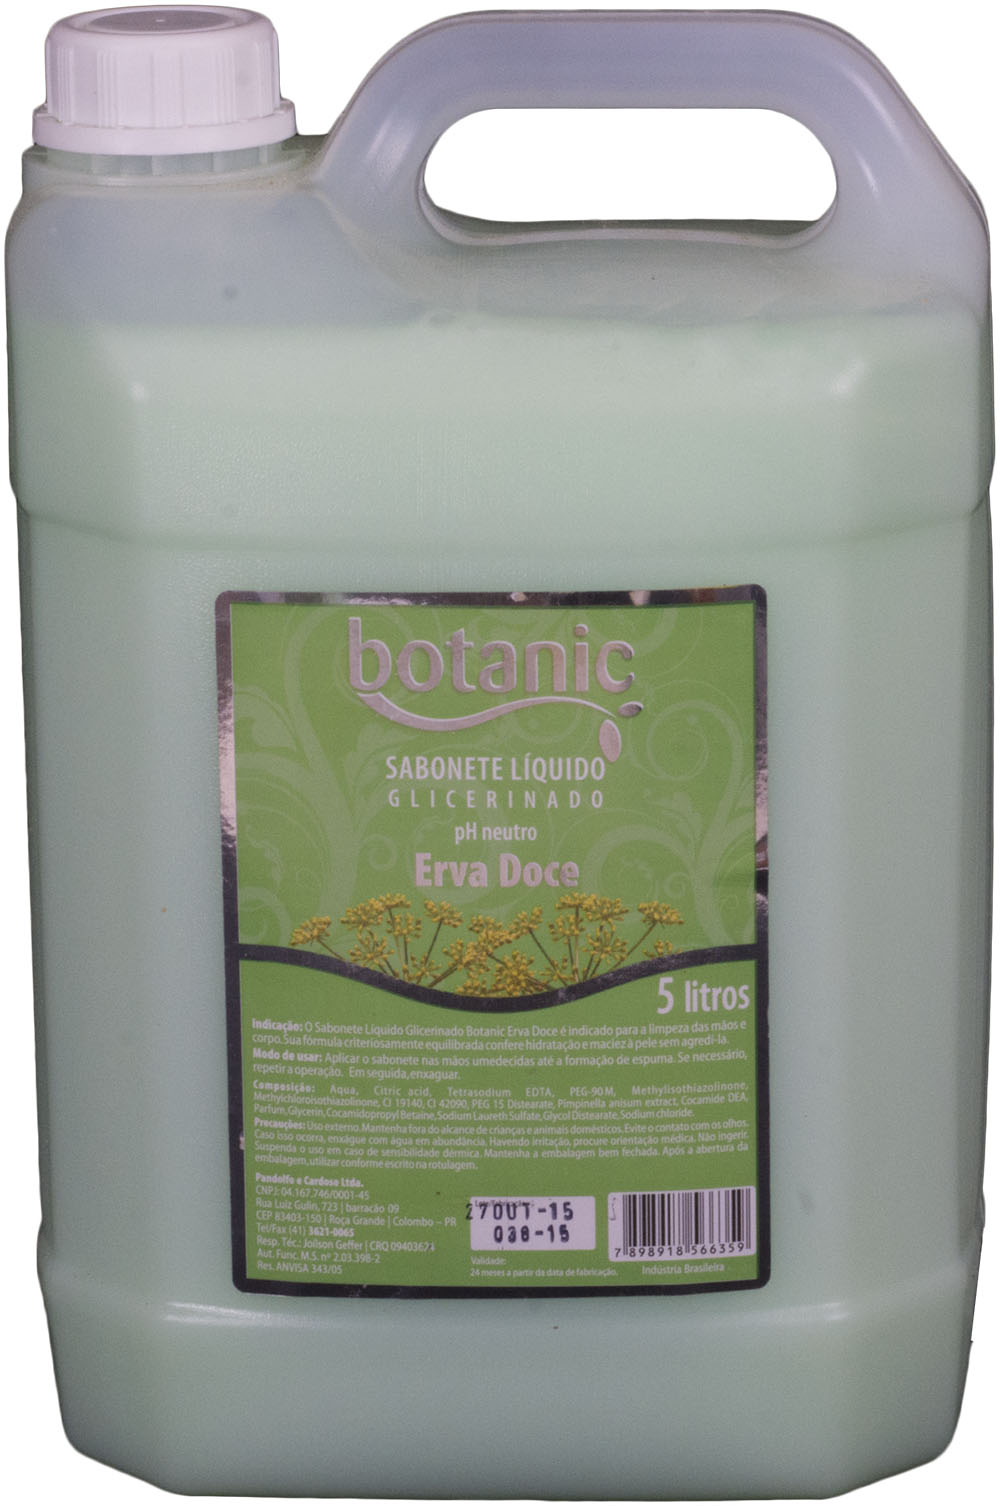 Sabonete líquido Erva Doce Bellplus pH Neutro 5 litros